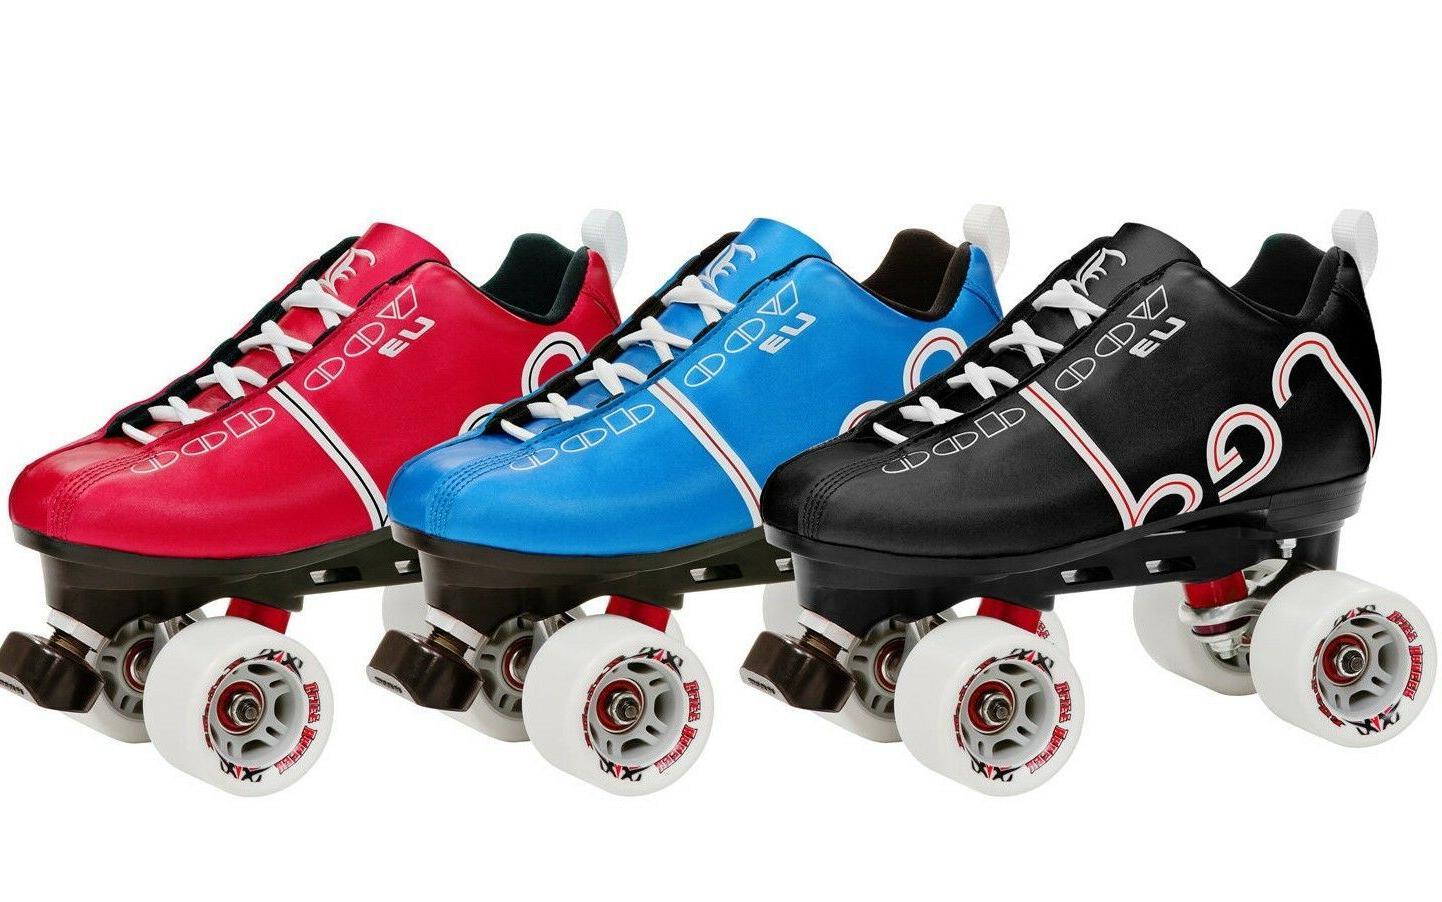 voodoo u3 quad speed roller skates choose